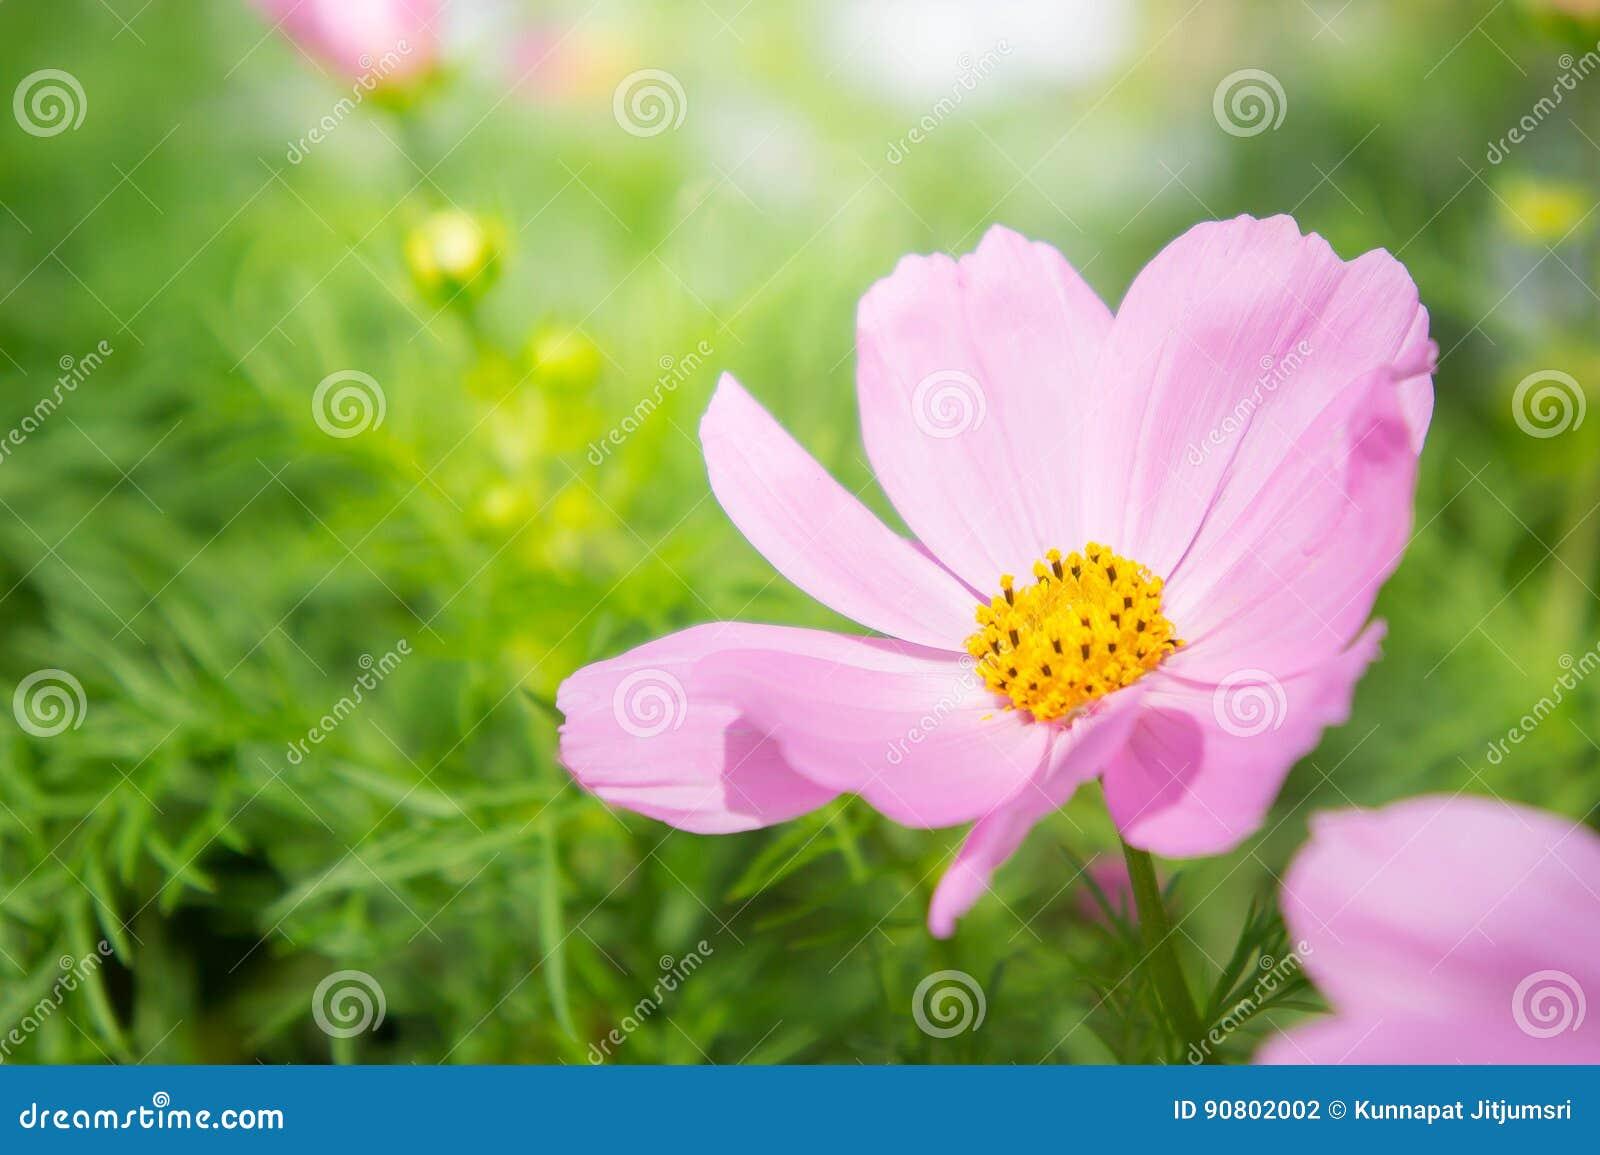 Маргаритка цветет, цветение цветков космоса в свете утра